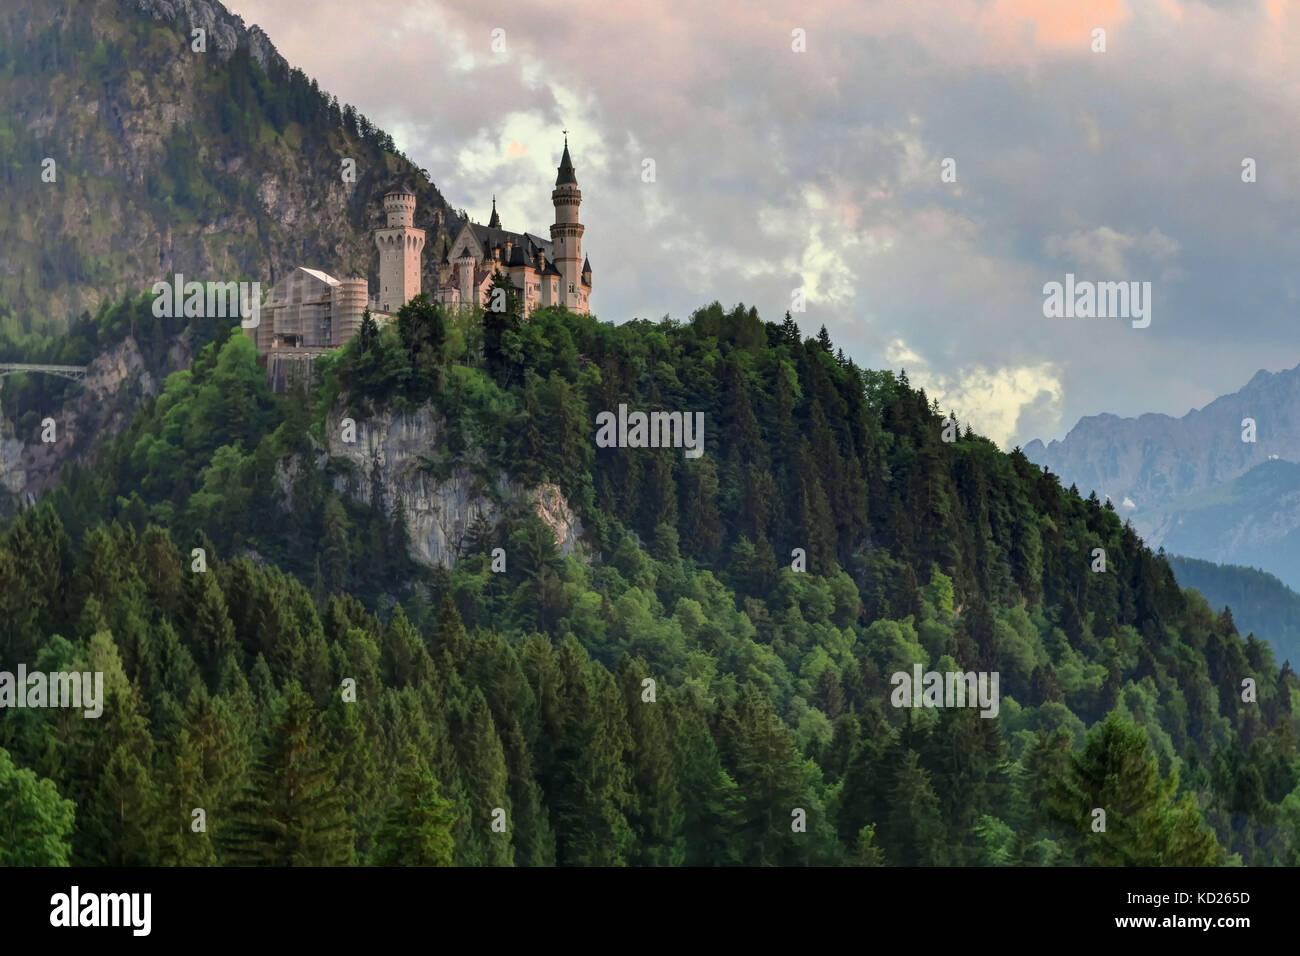 Front shot of Neuschwanstein Castle and forest, near Füssen in southwest Bavaria, Germany. - Stock Image